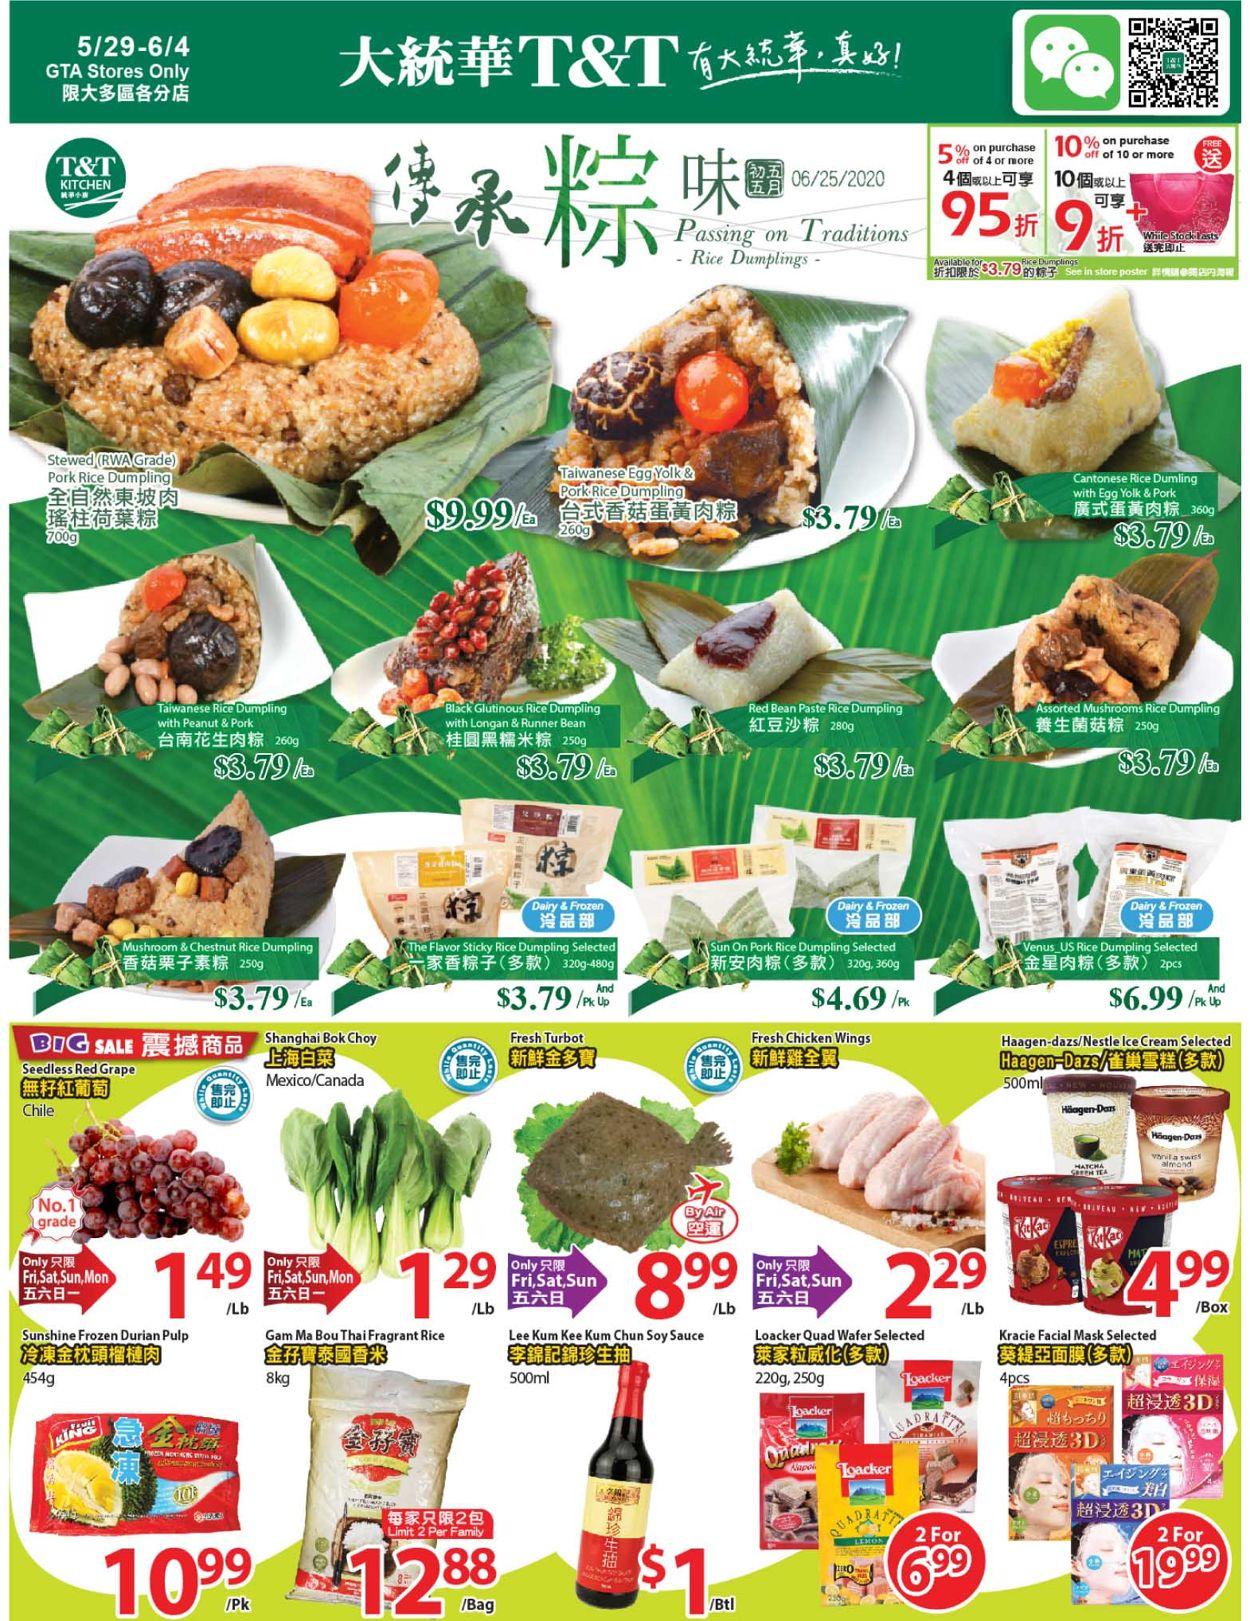 T&T Supermarket Flyer - 05/29-06/04/2020